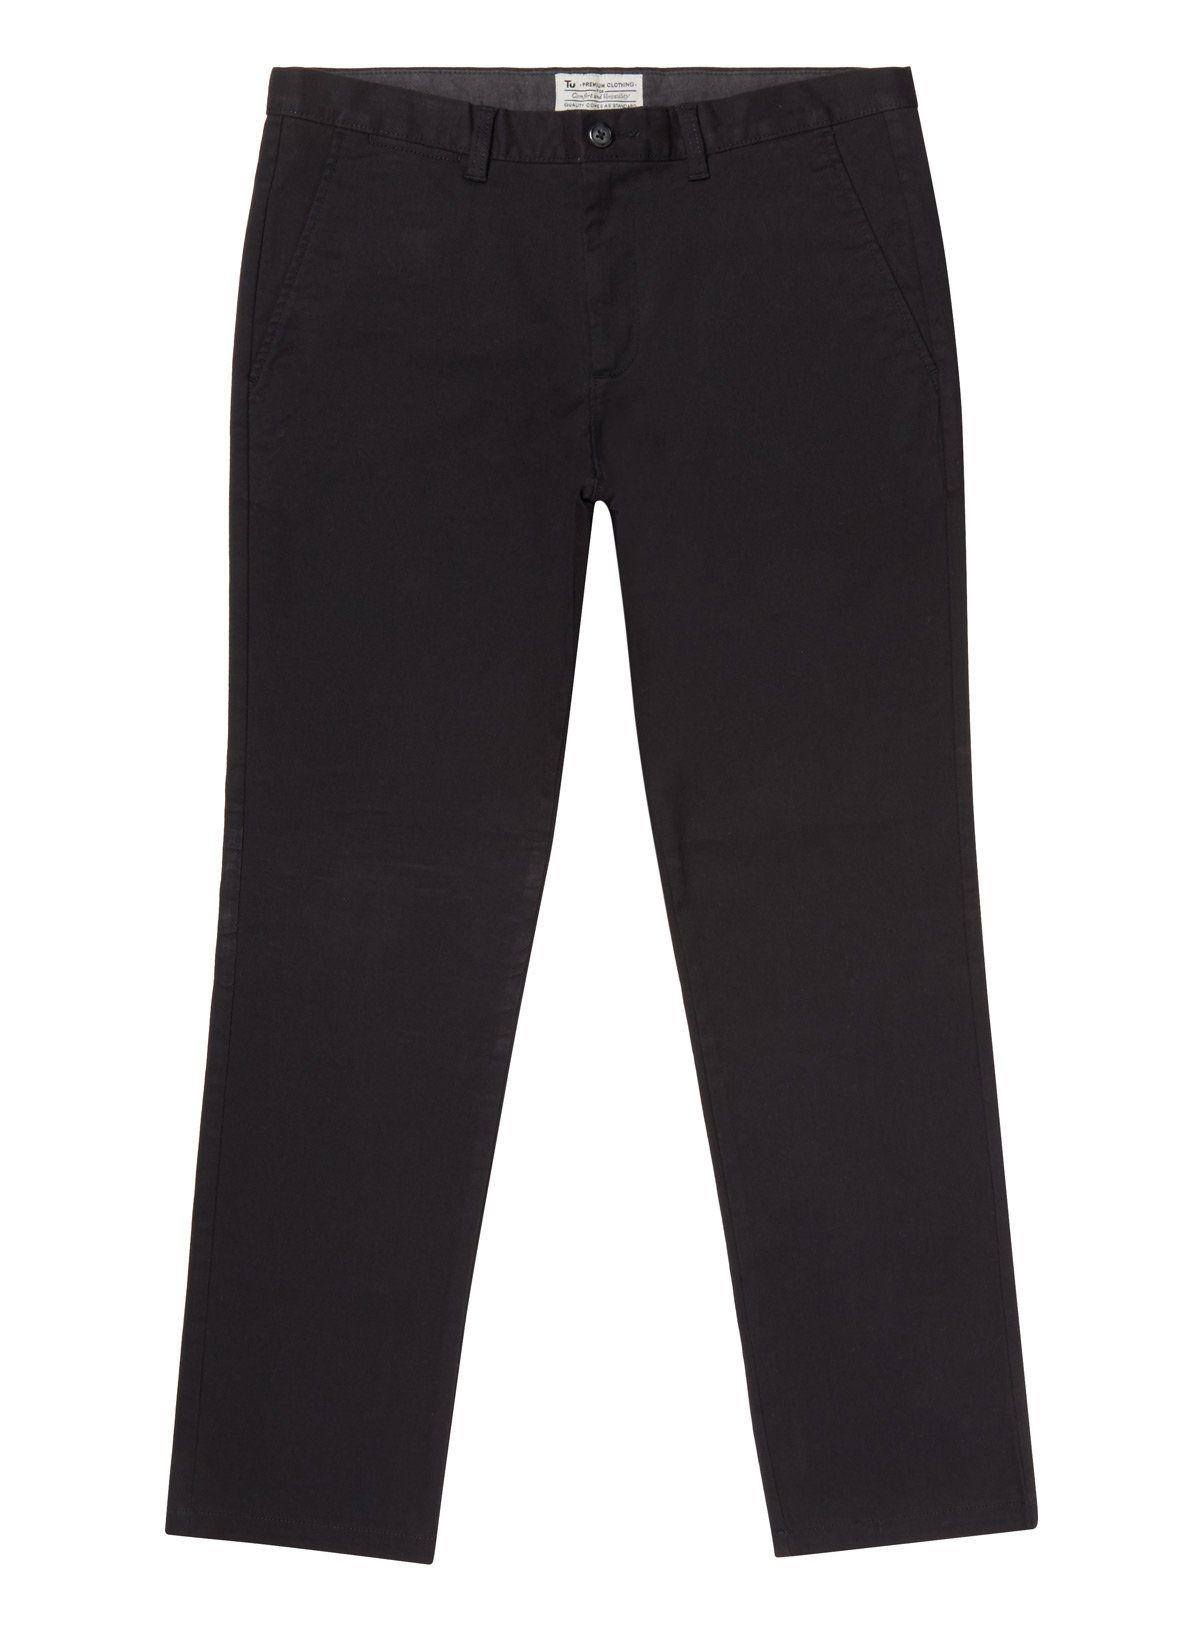 Black Straight Leg Chinos With Stretch - W48 L32